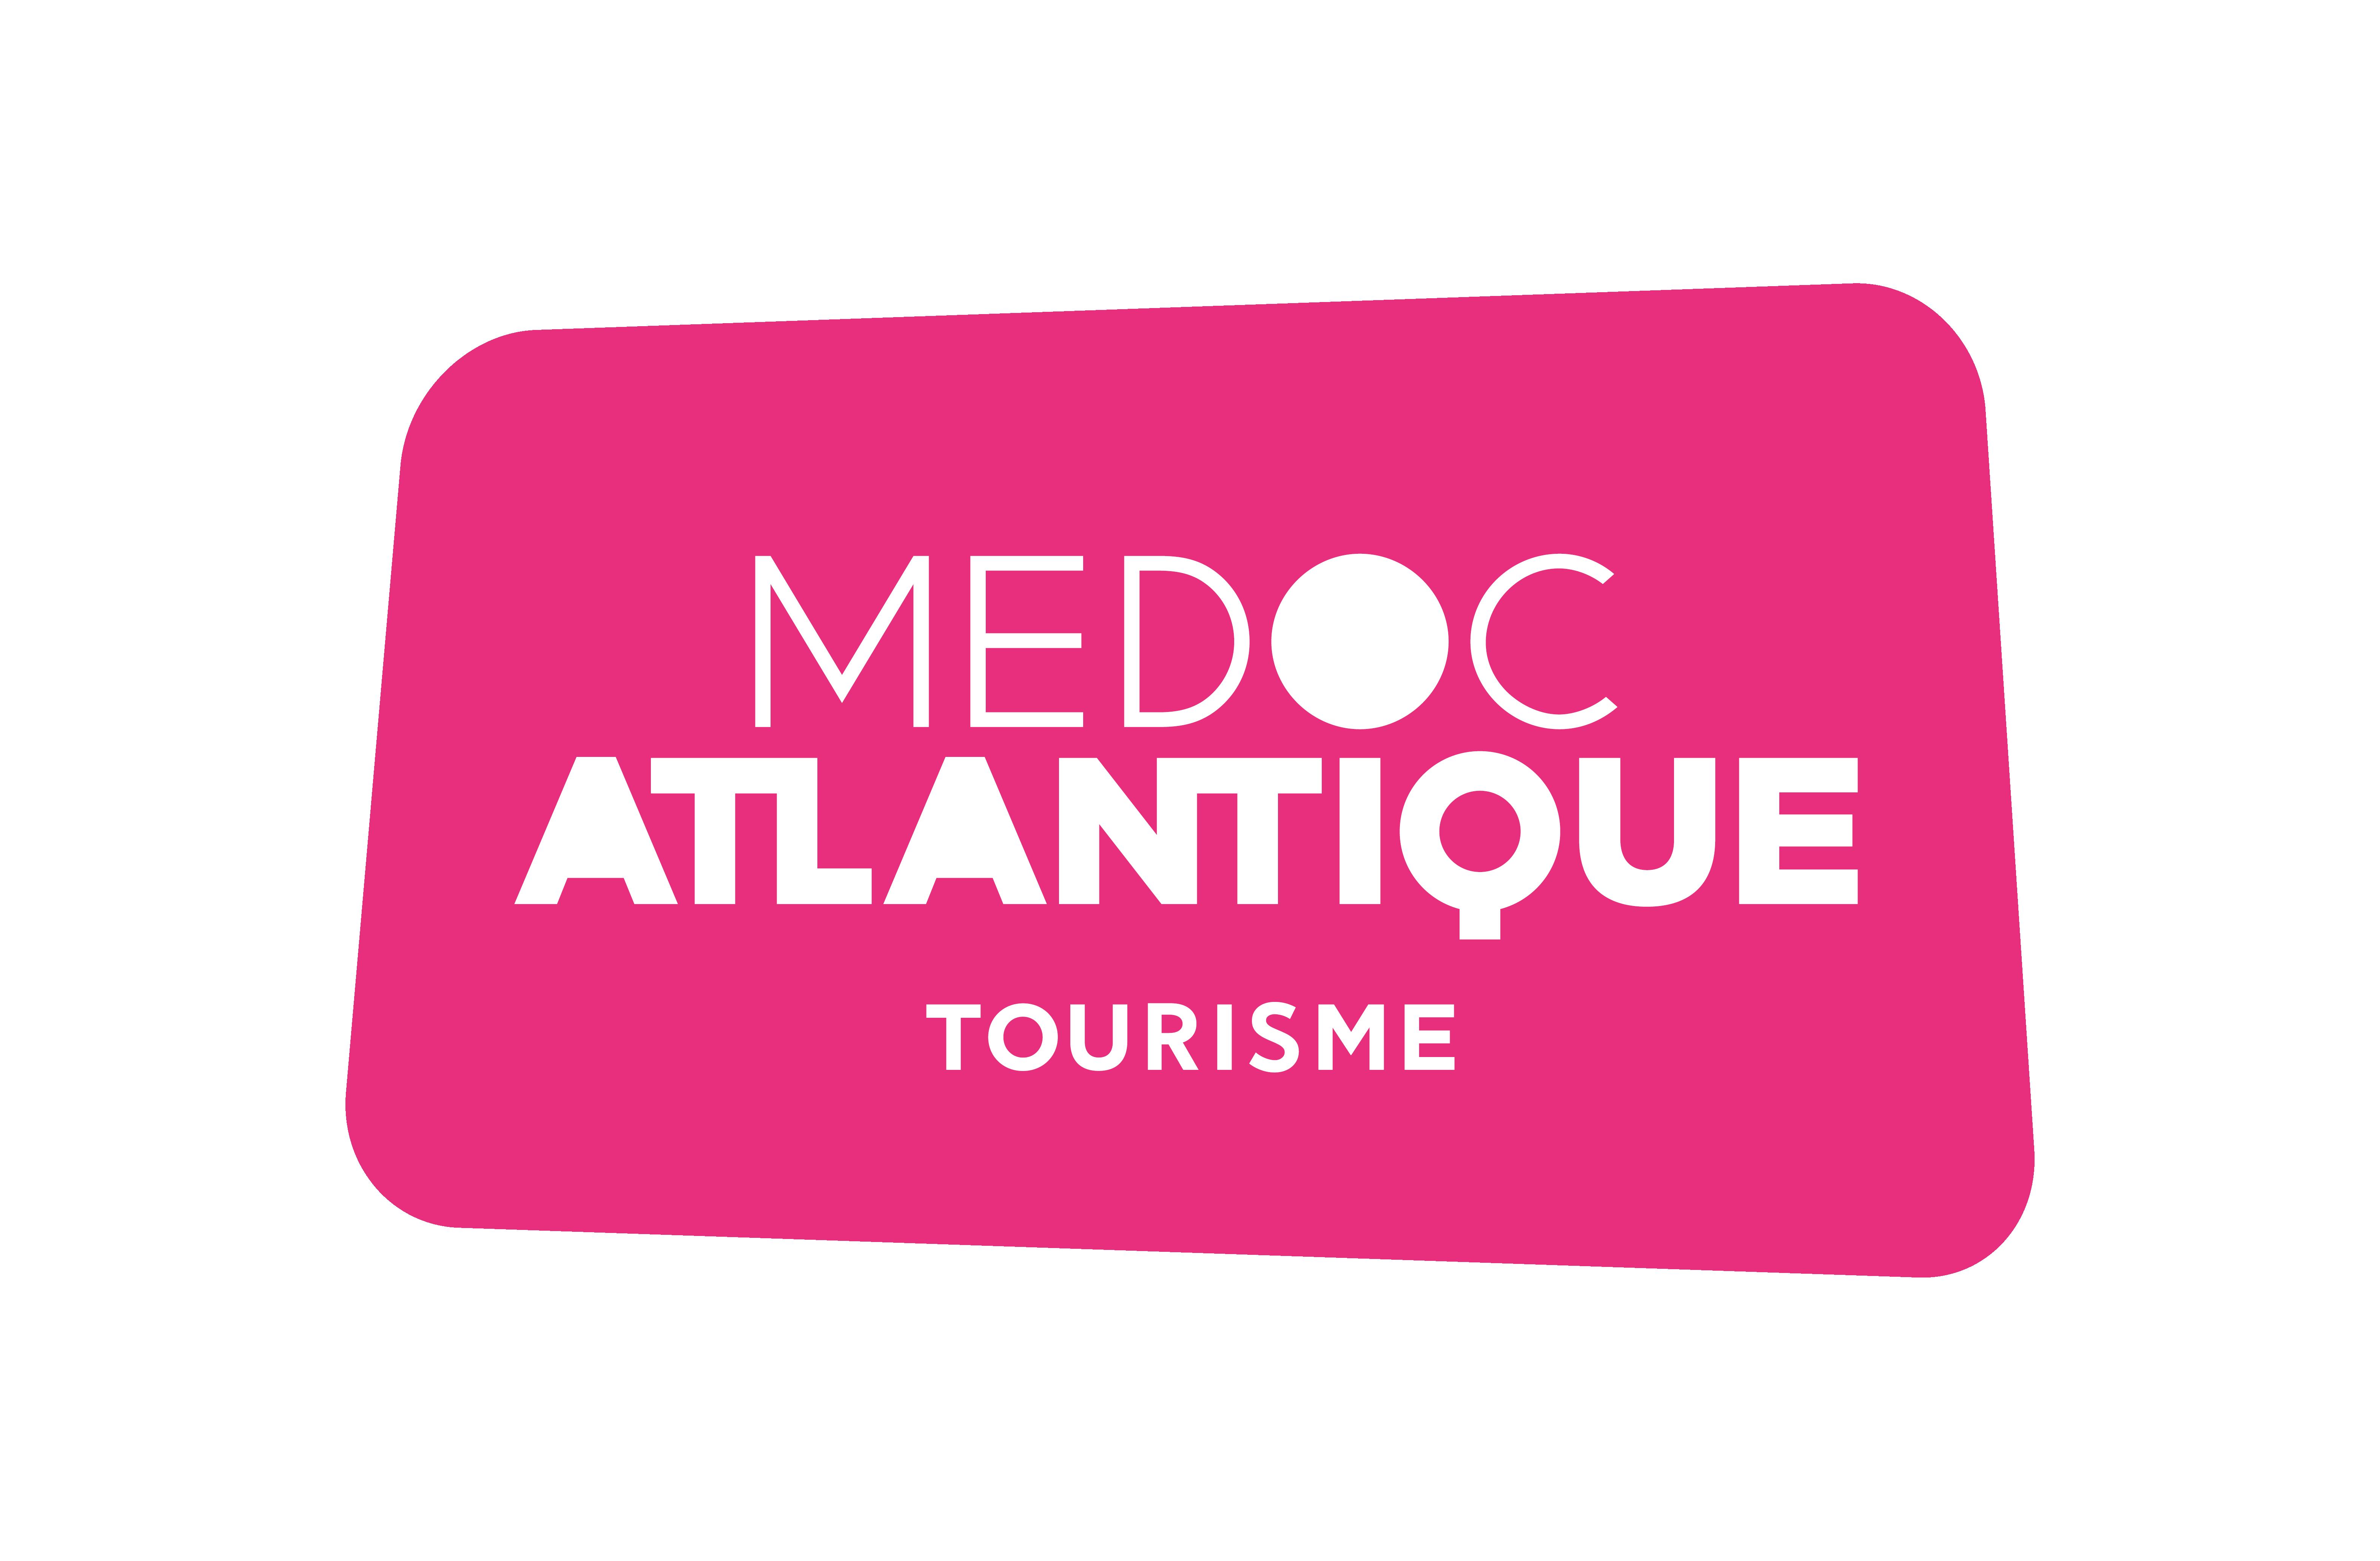 logo medoc atlantique